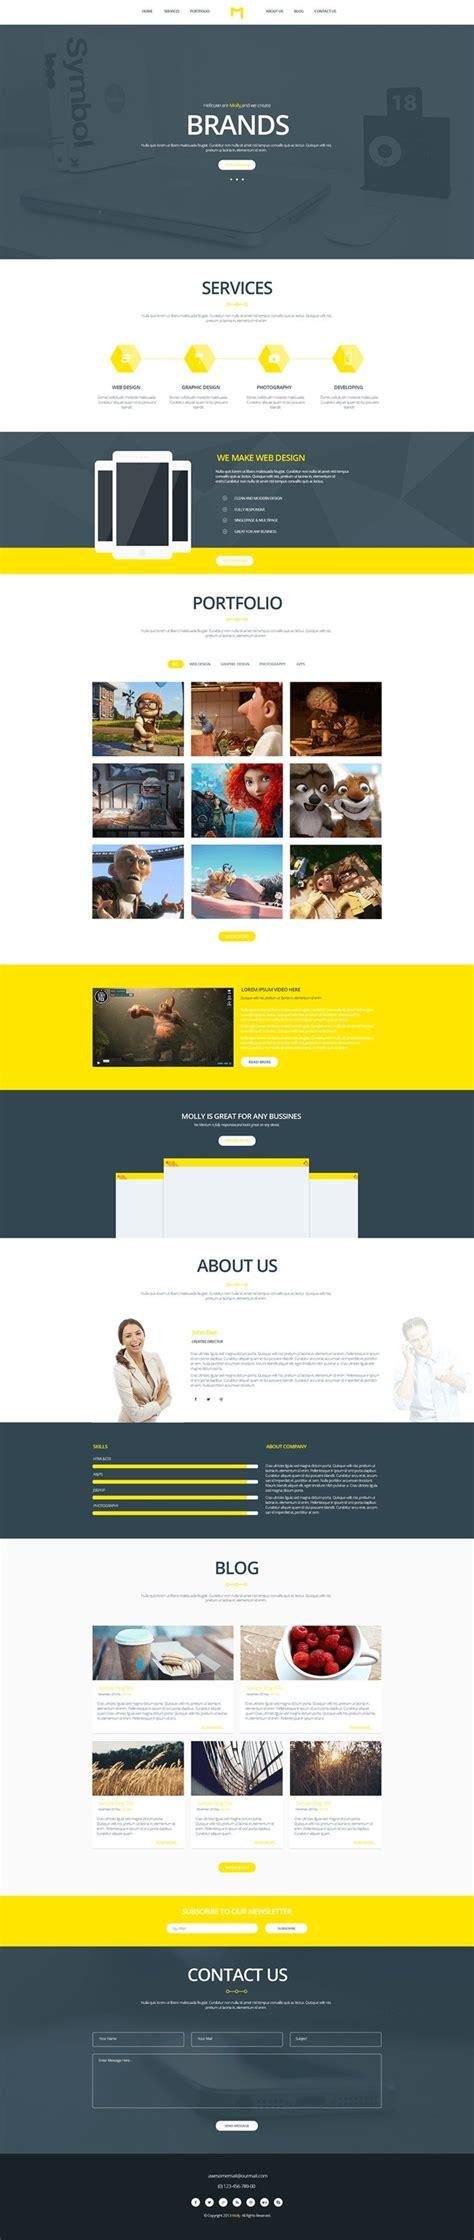 artica psd one page web template preview web design pinterest